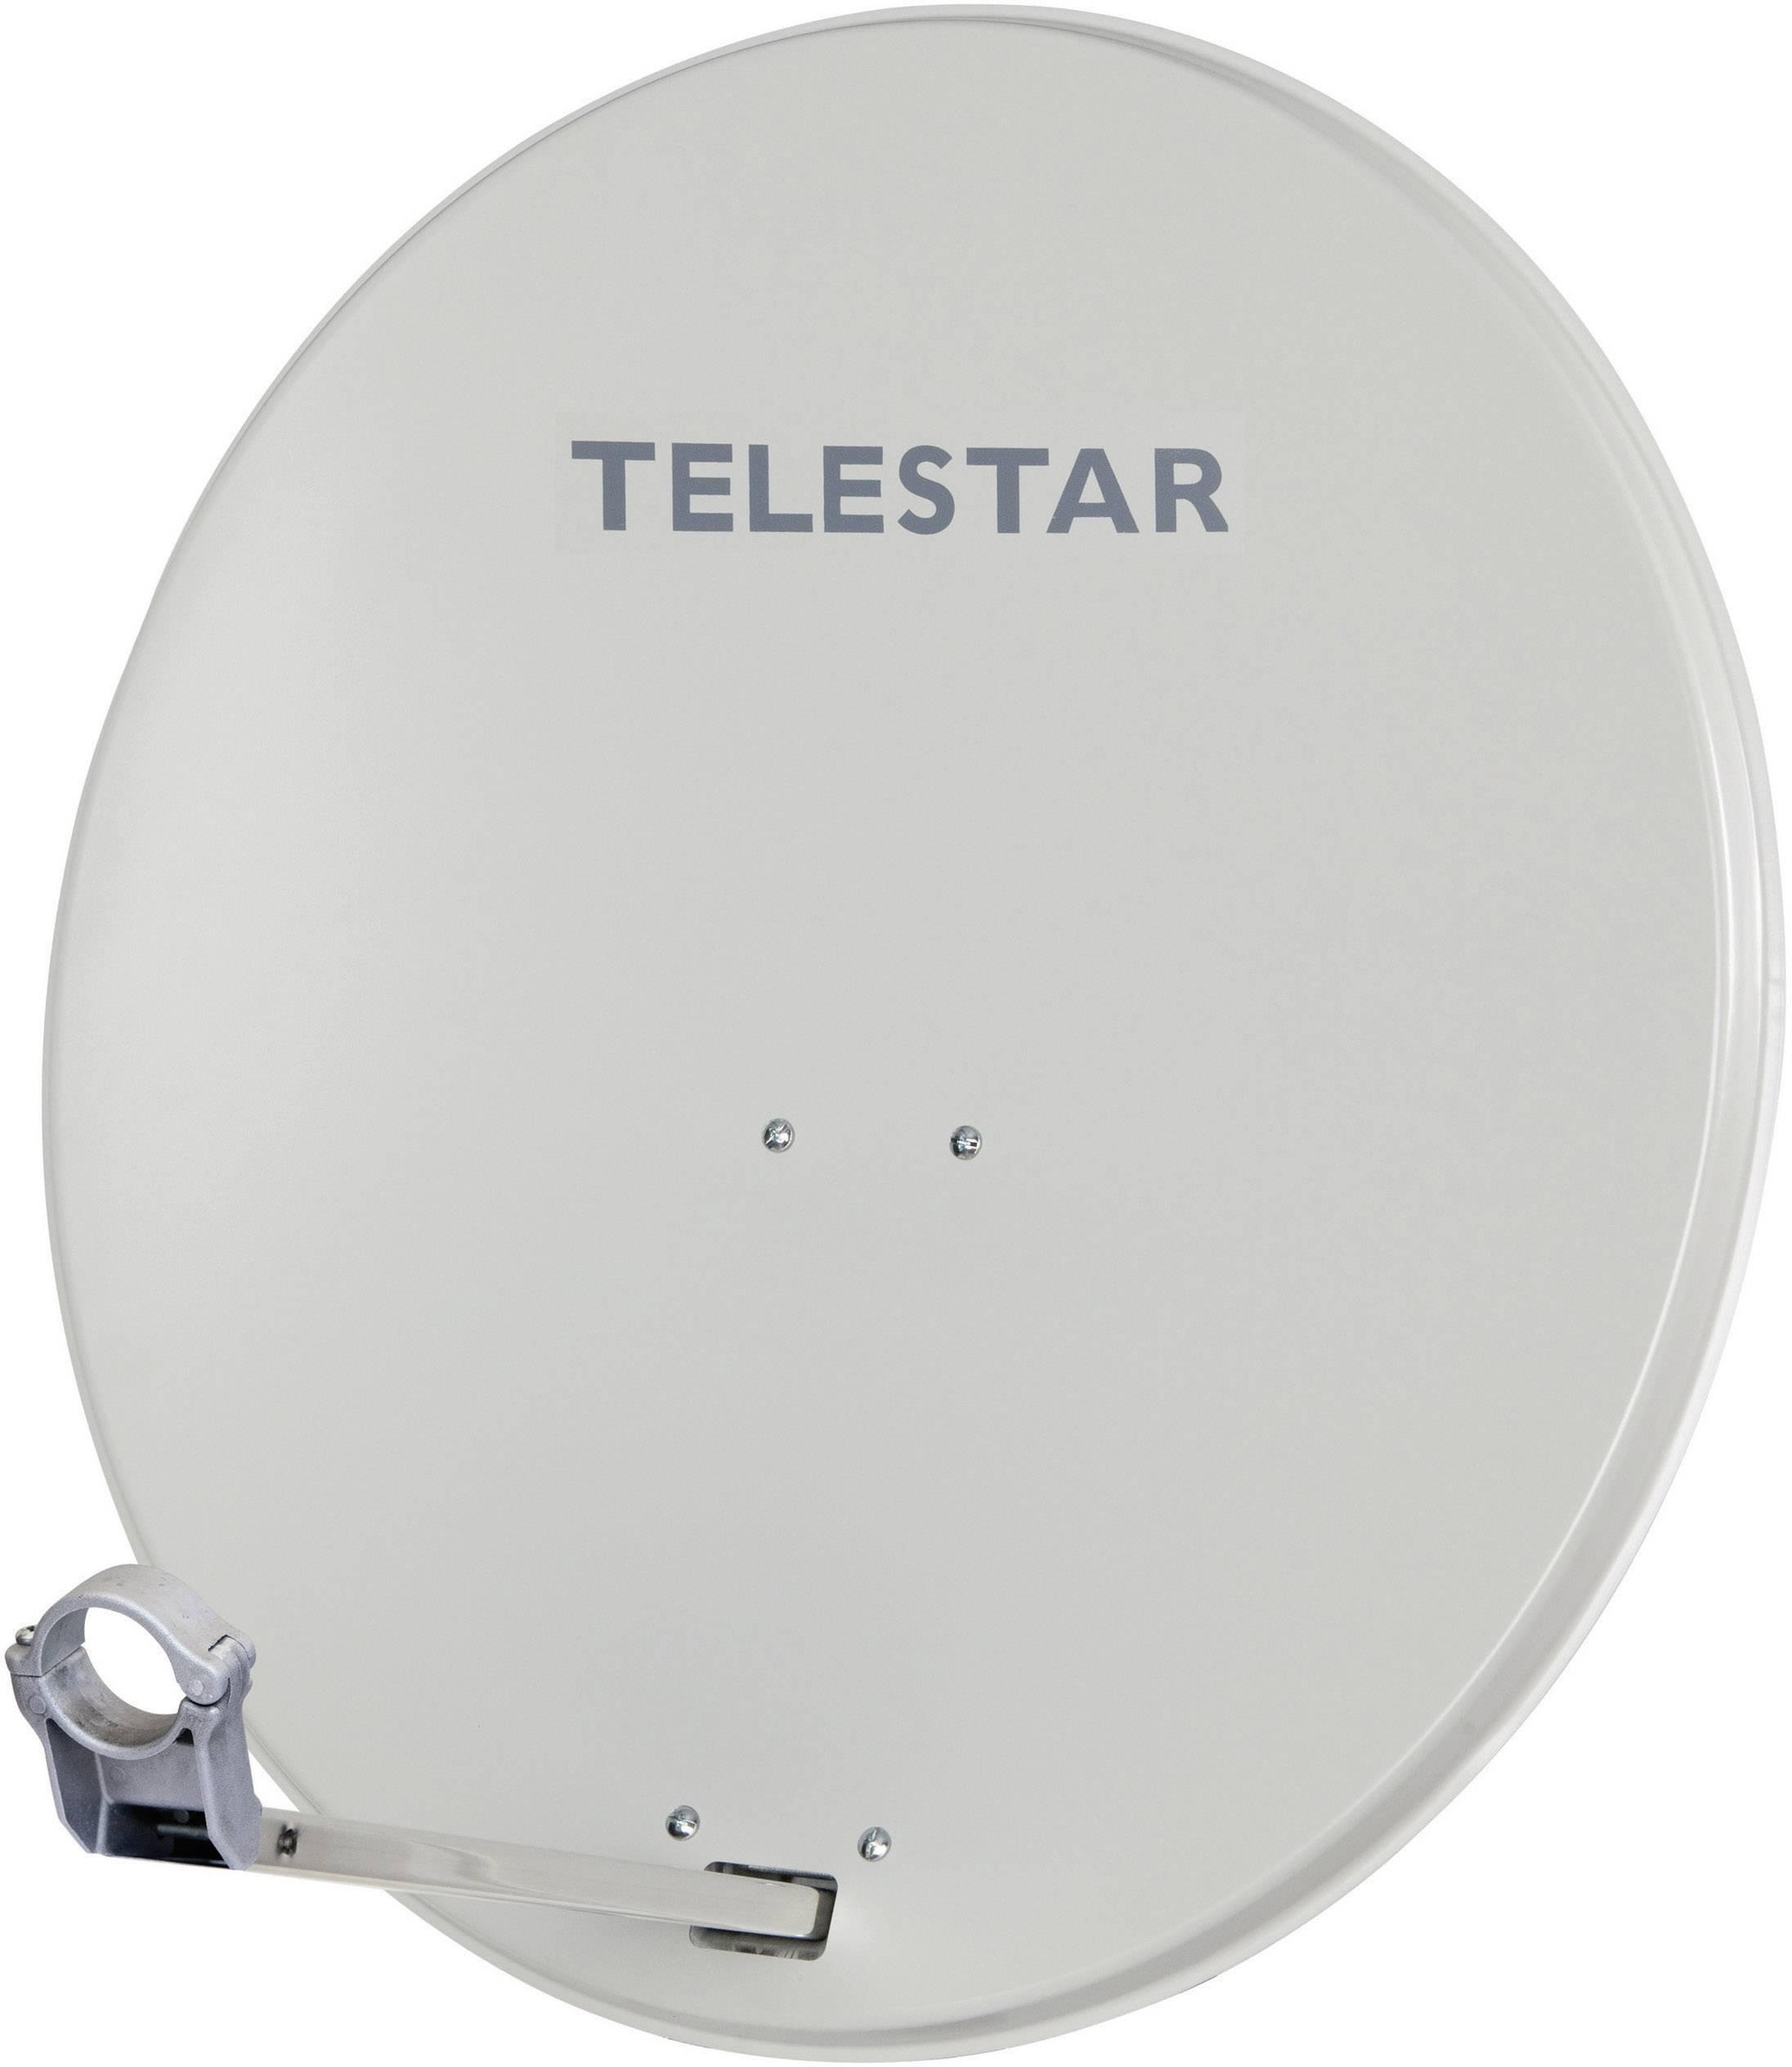 Telestar DIGIRAPID 80 Antenna